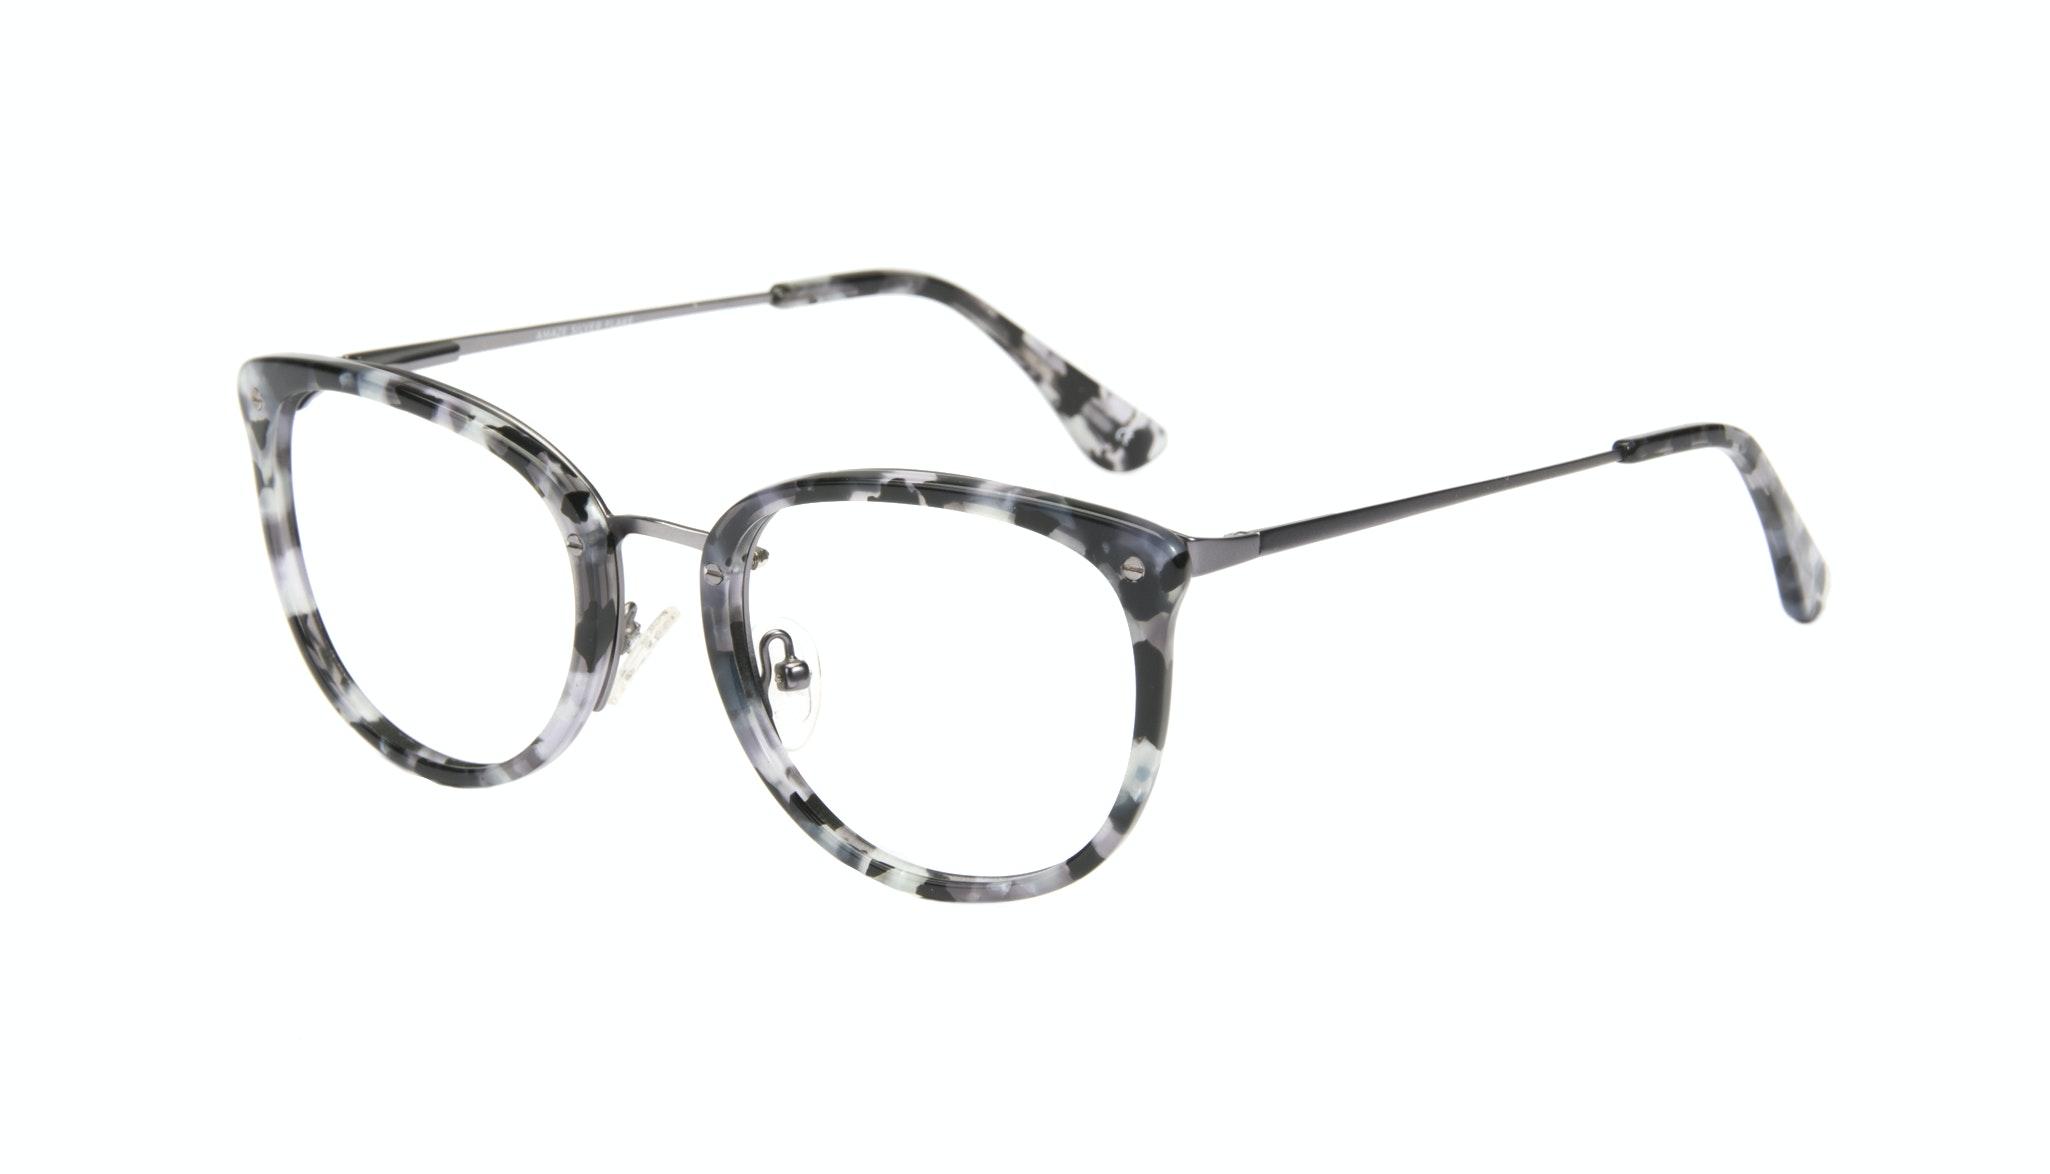 Affordable Fashion Glasses Square Round Eyeglasses Women Amaze Silver Flake Tilt